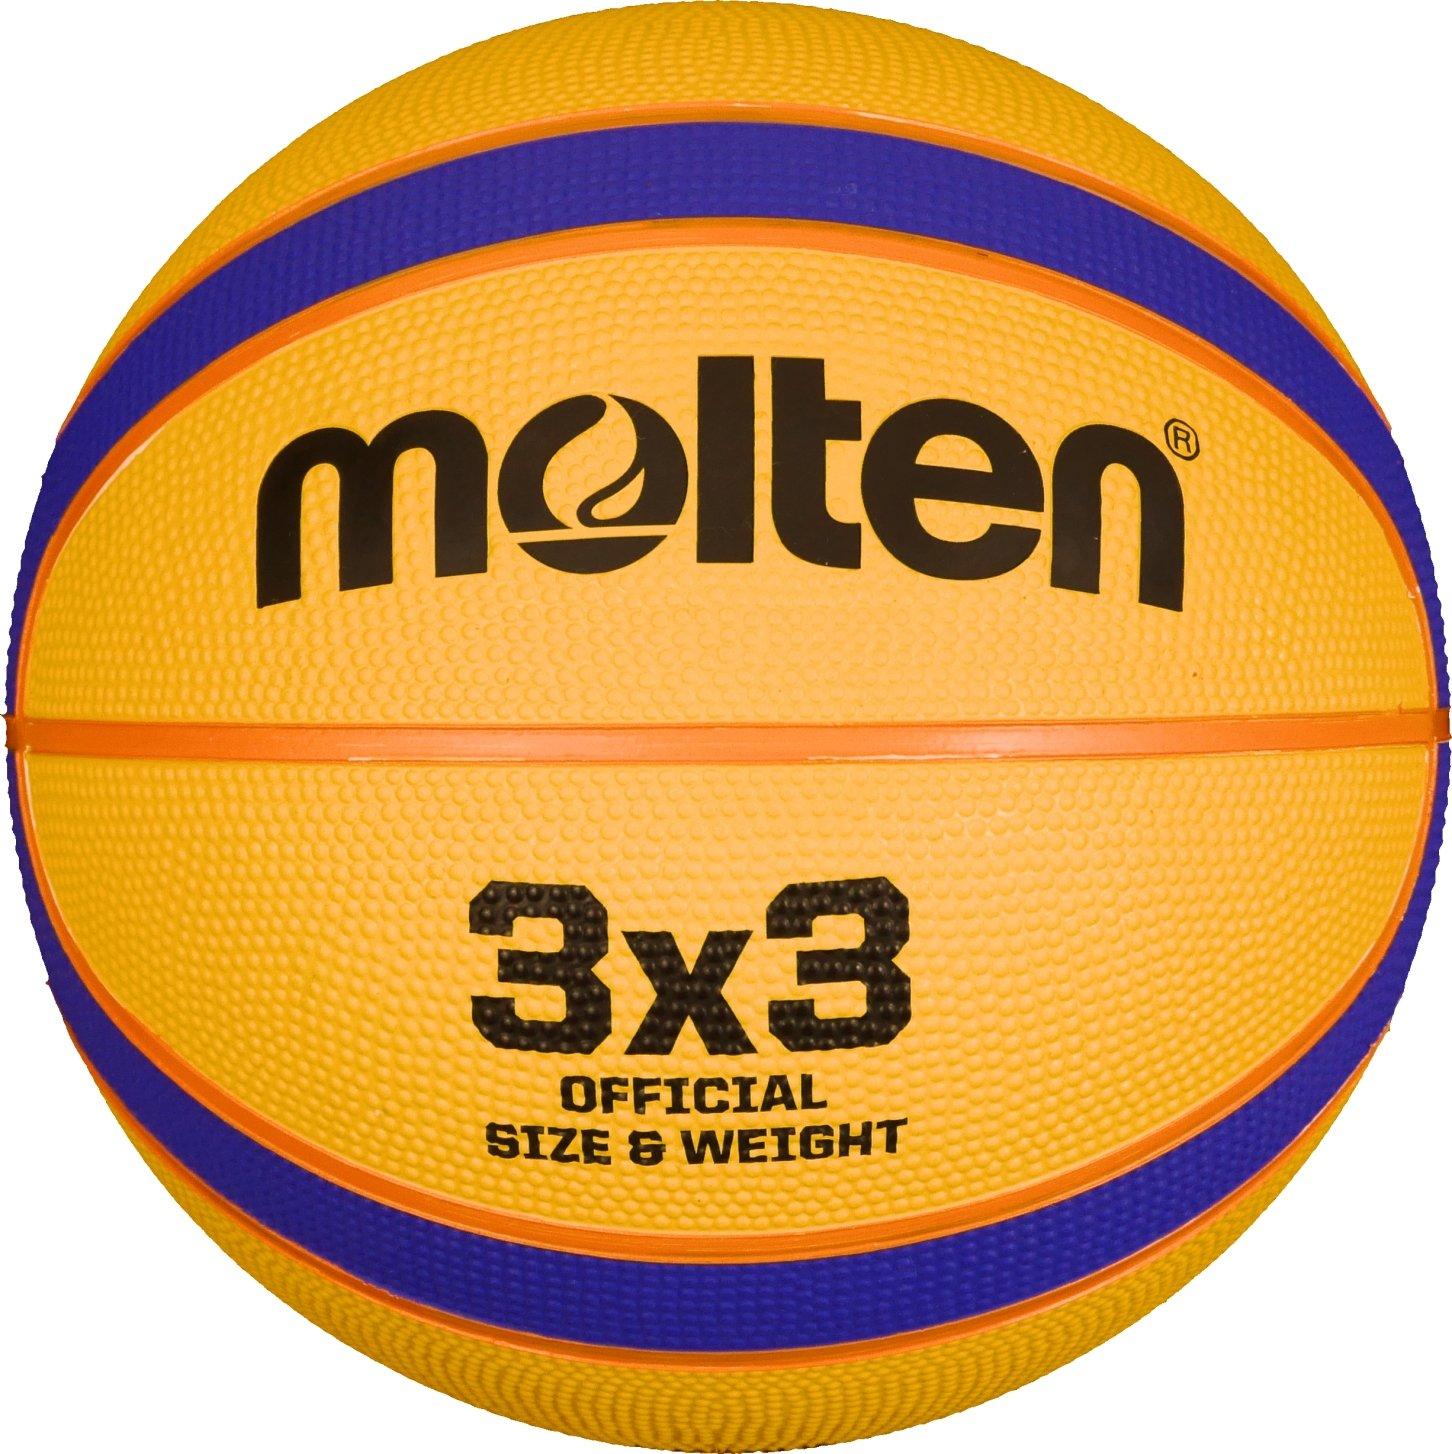 Molten Erwachsene B33T2000 Basketball, Gelb, 6 MLTN5|#molten